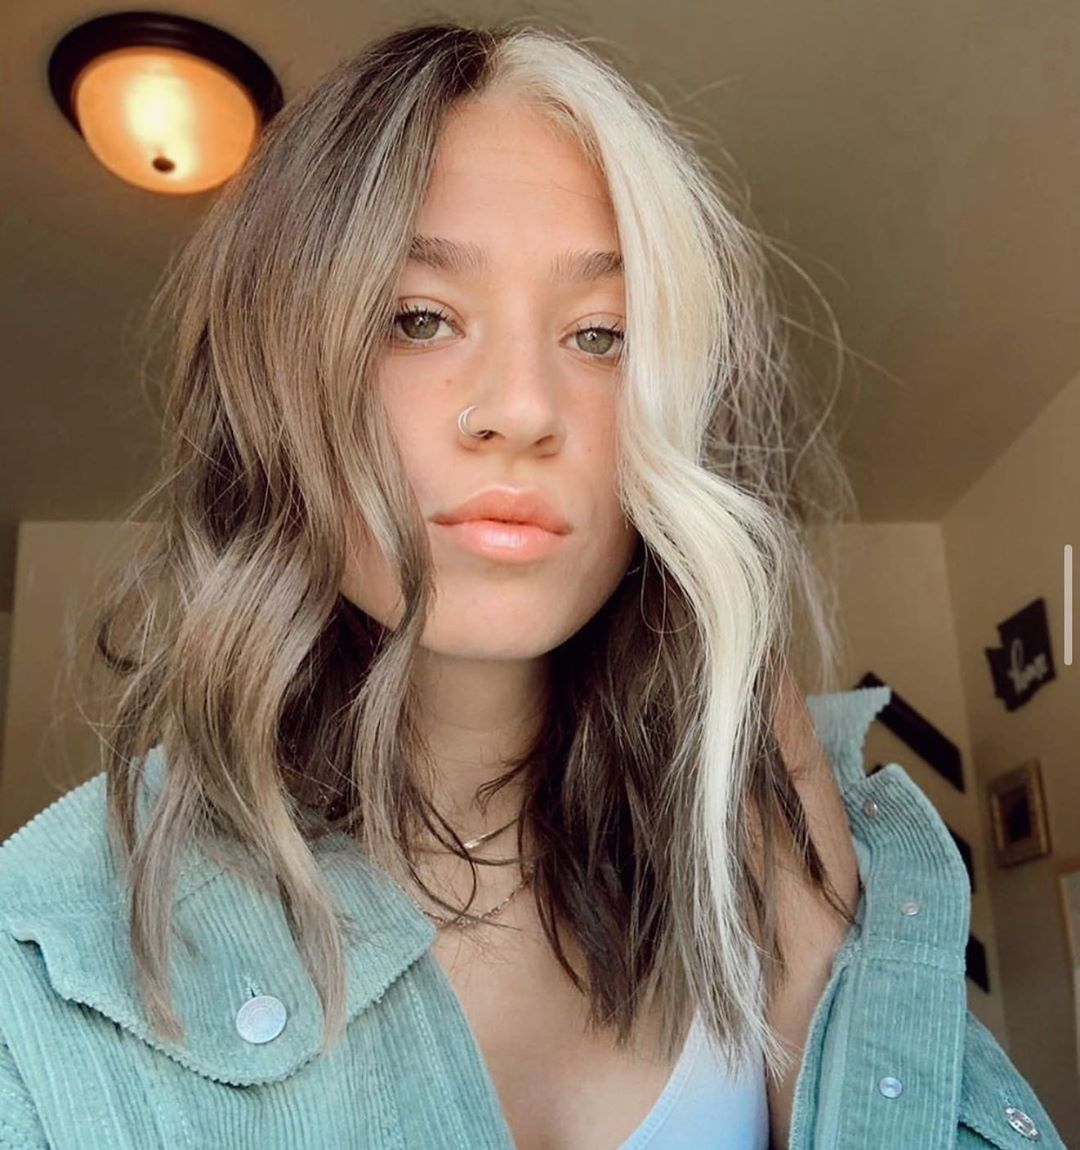 Pretty Medium Length Wavy Haircut Ideas - Women Shoulder Length Hairstyle Designs 2021 - 2022